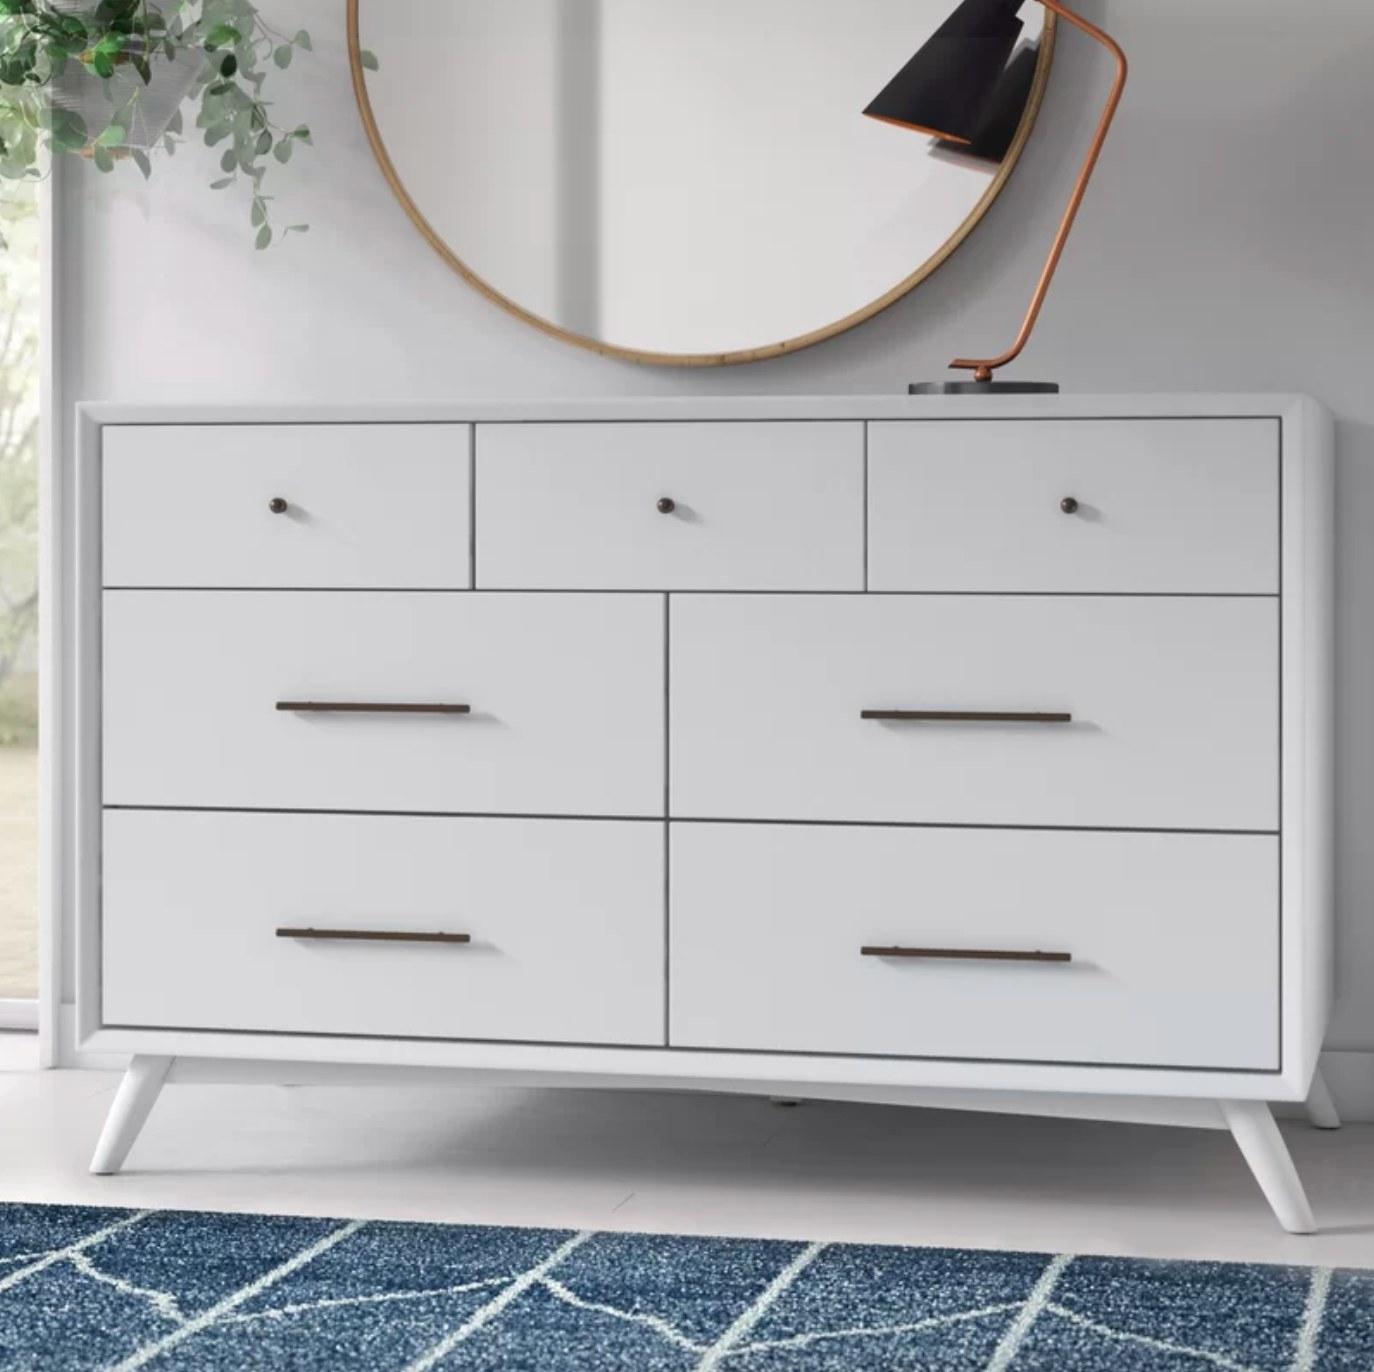 The seven drawer dresser in white